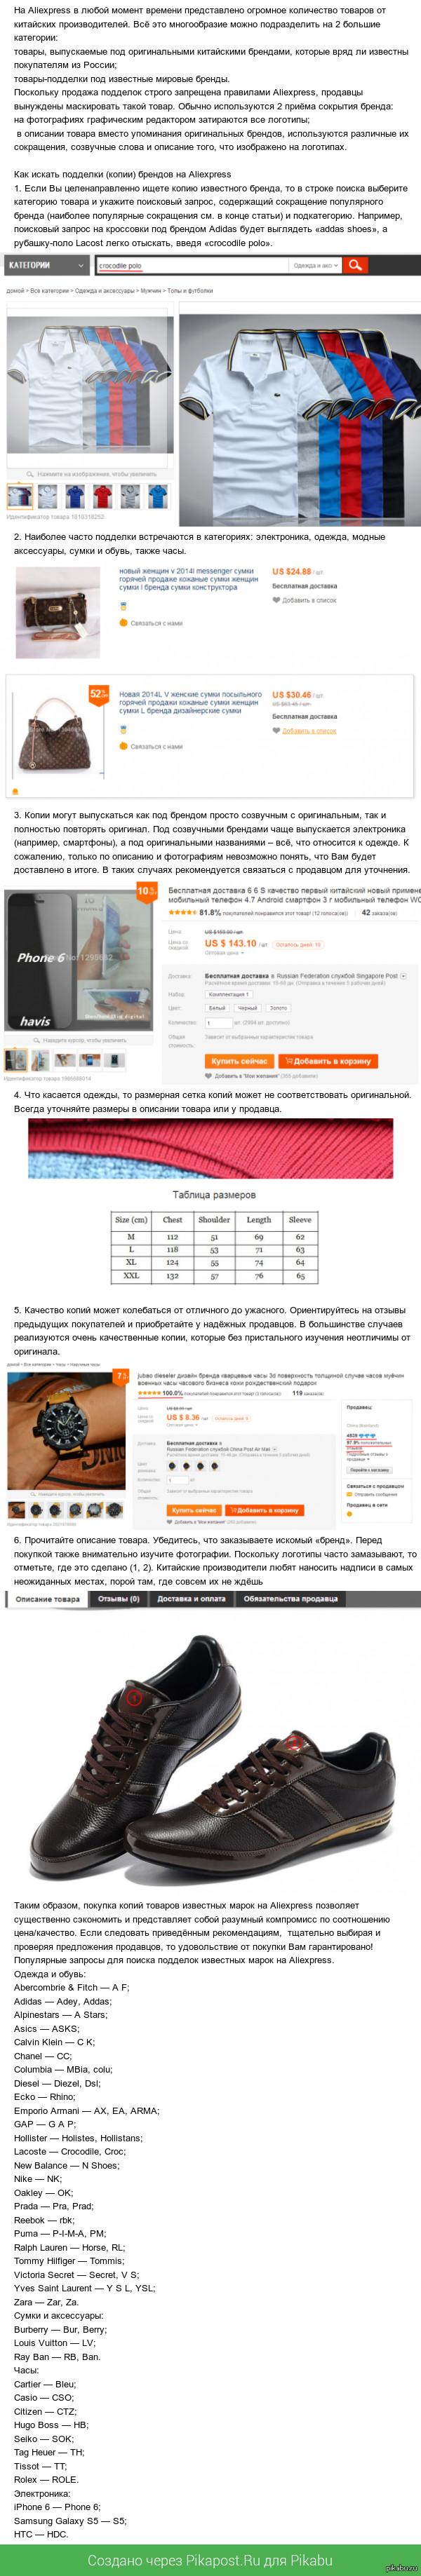 a33a37bce8e6 Как искать подделки (копии) брендов на Aliexpress